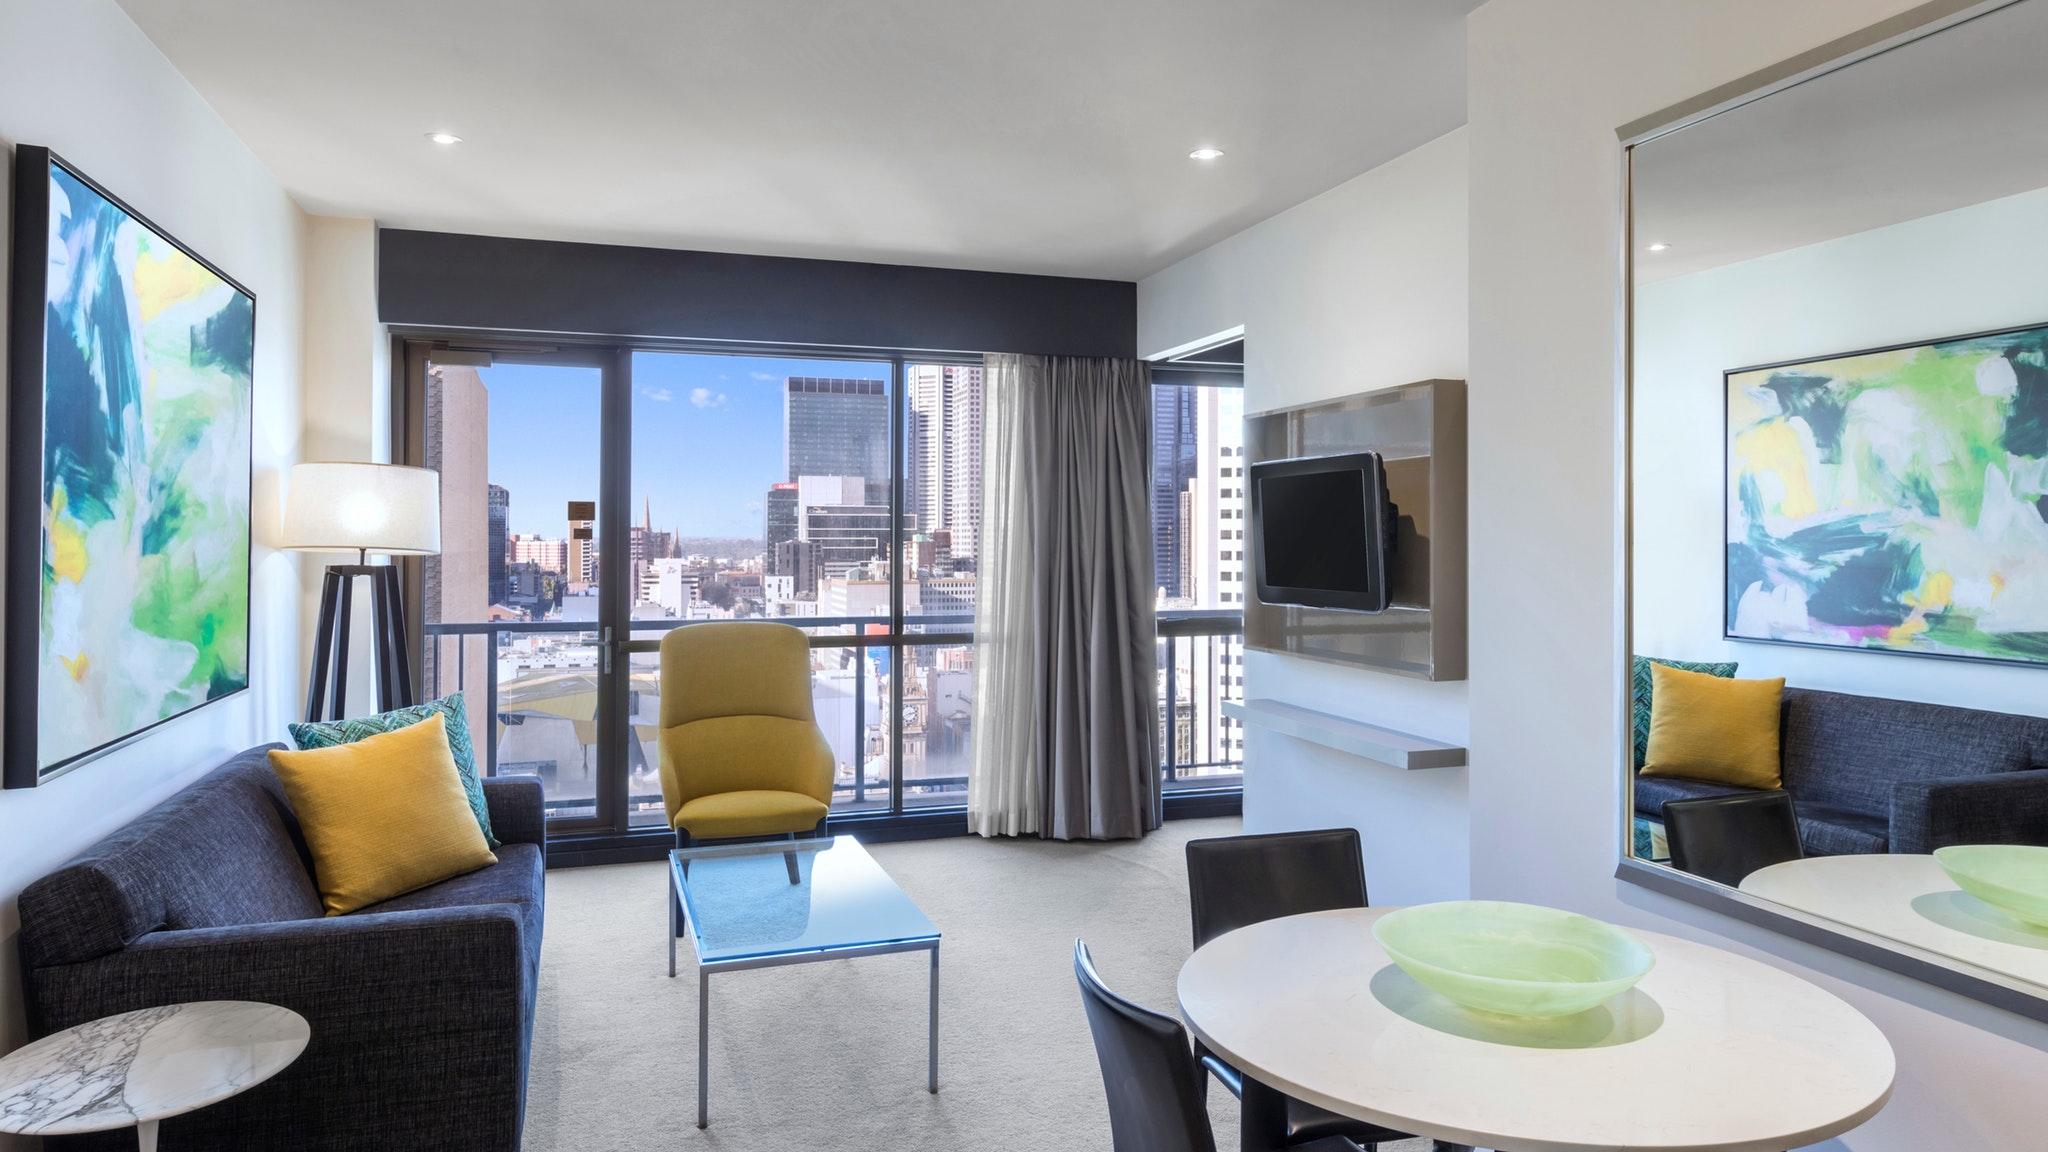 Adina Apartment Hotel Melbourne, Accommodation, Melbourne ...